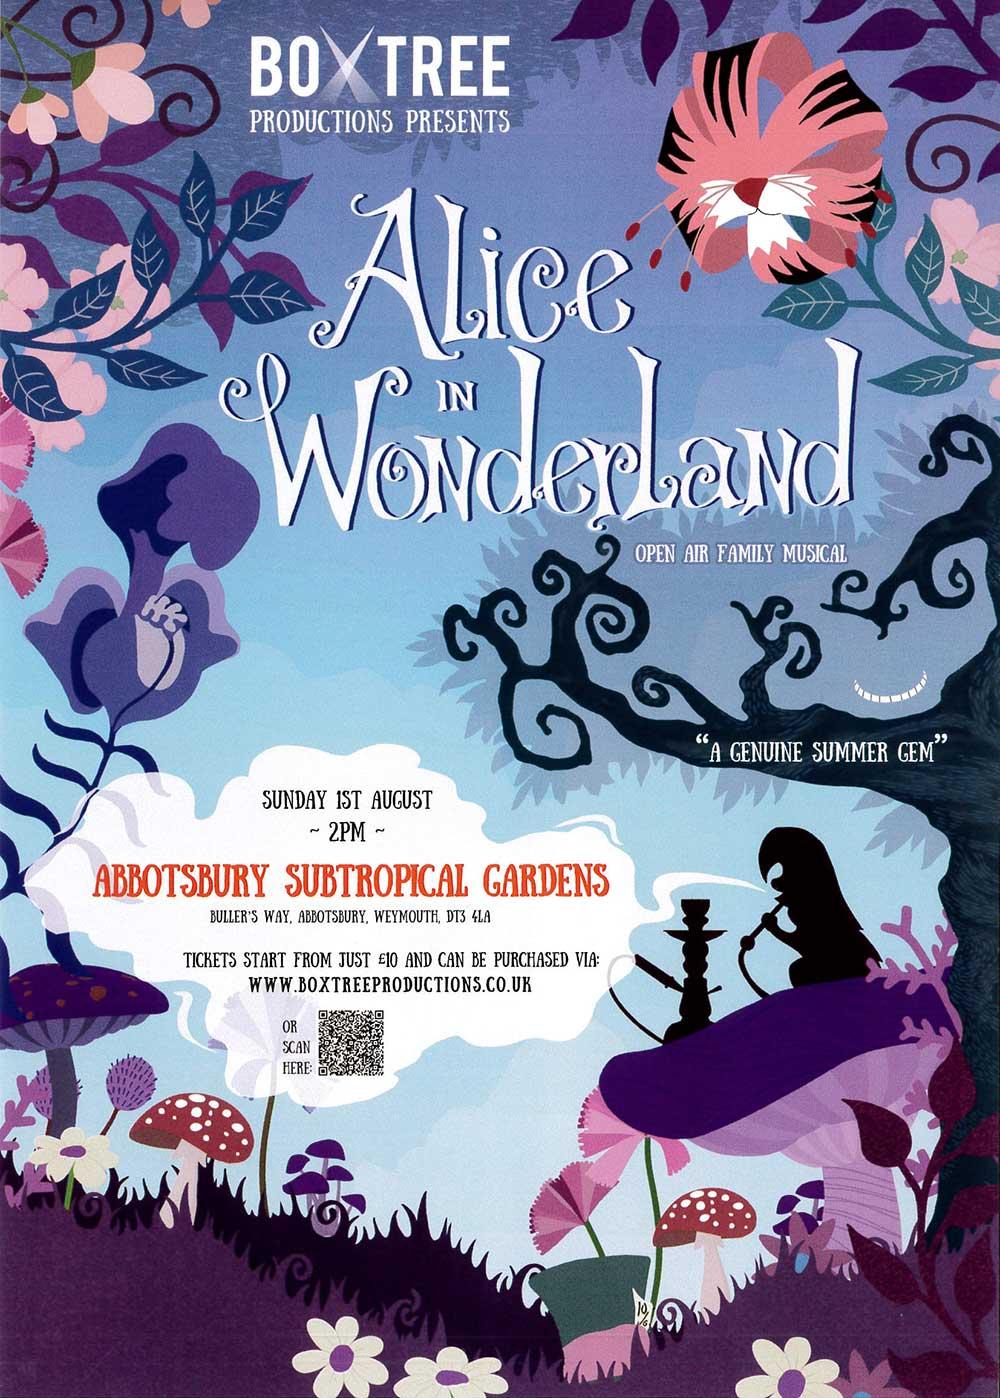 Box Tree Productions presents Alice in Wonderland at Abbotsbury Subtropical Gardens